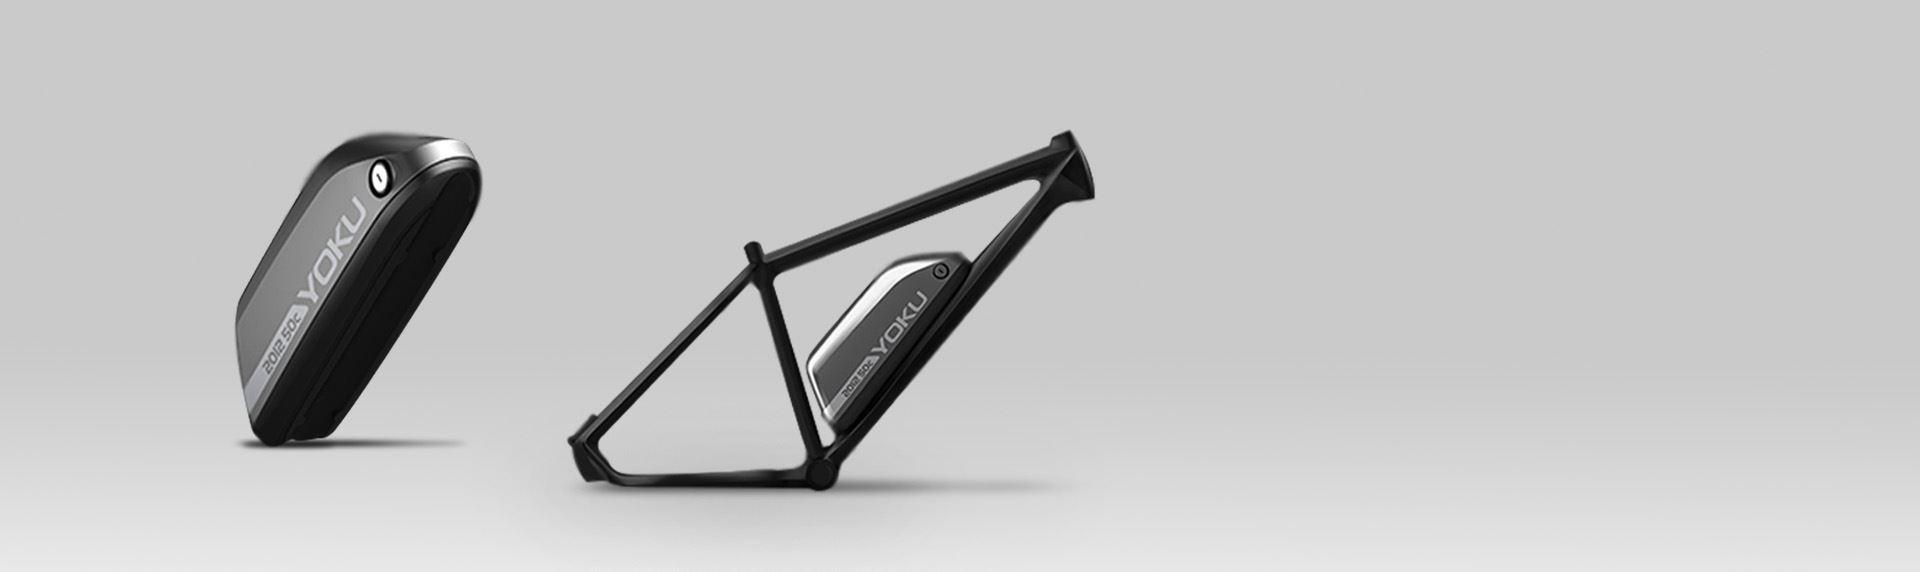 SSC设计-山地款锂电池